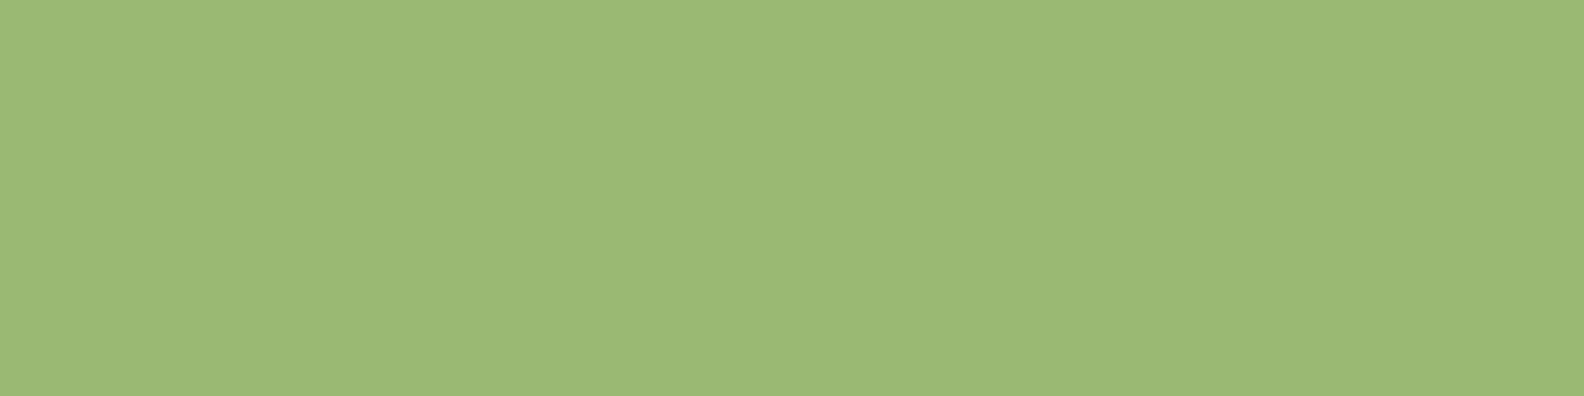 1584x396 Olivine Solid Color Background